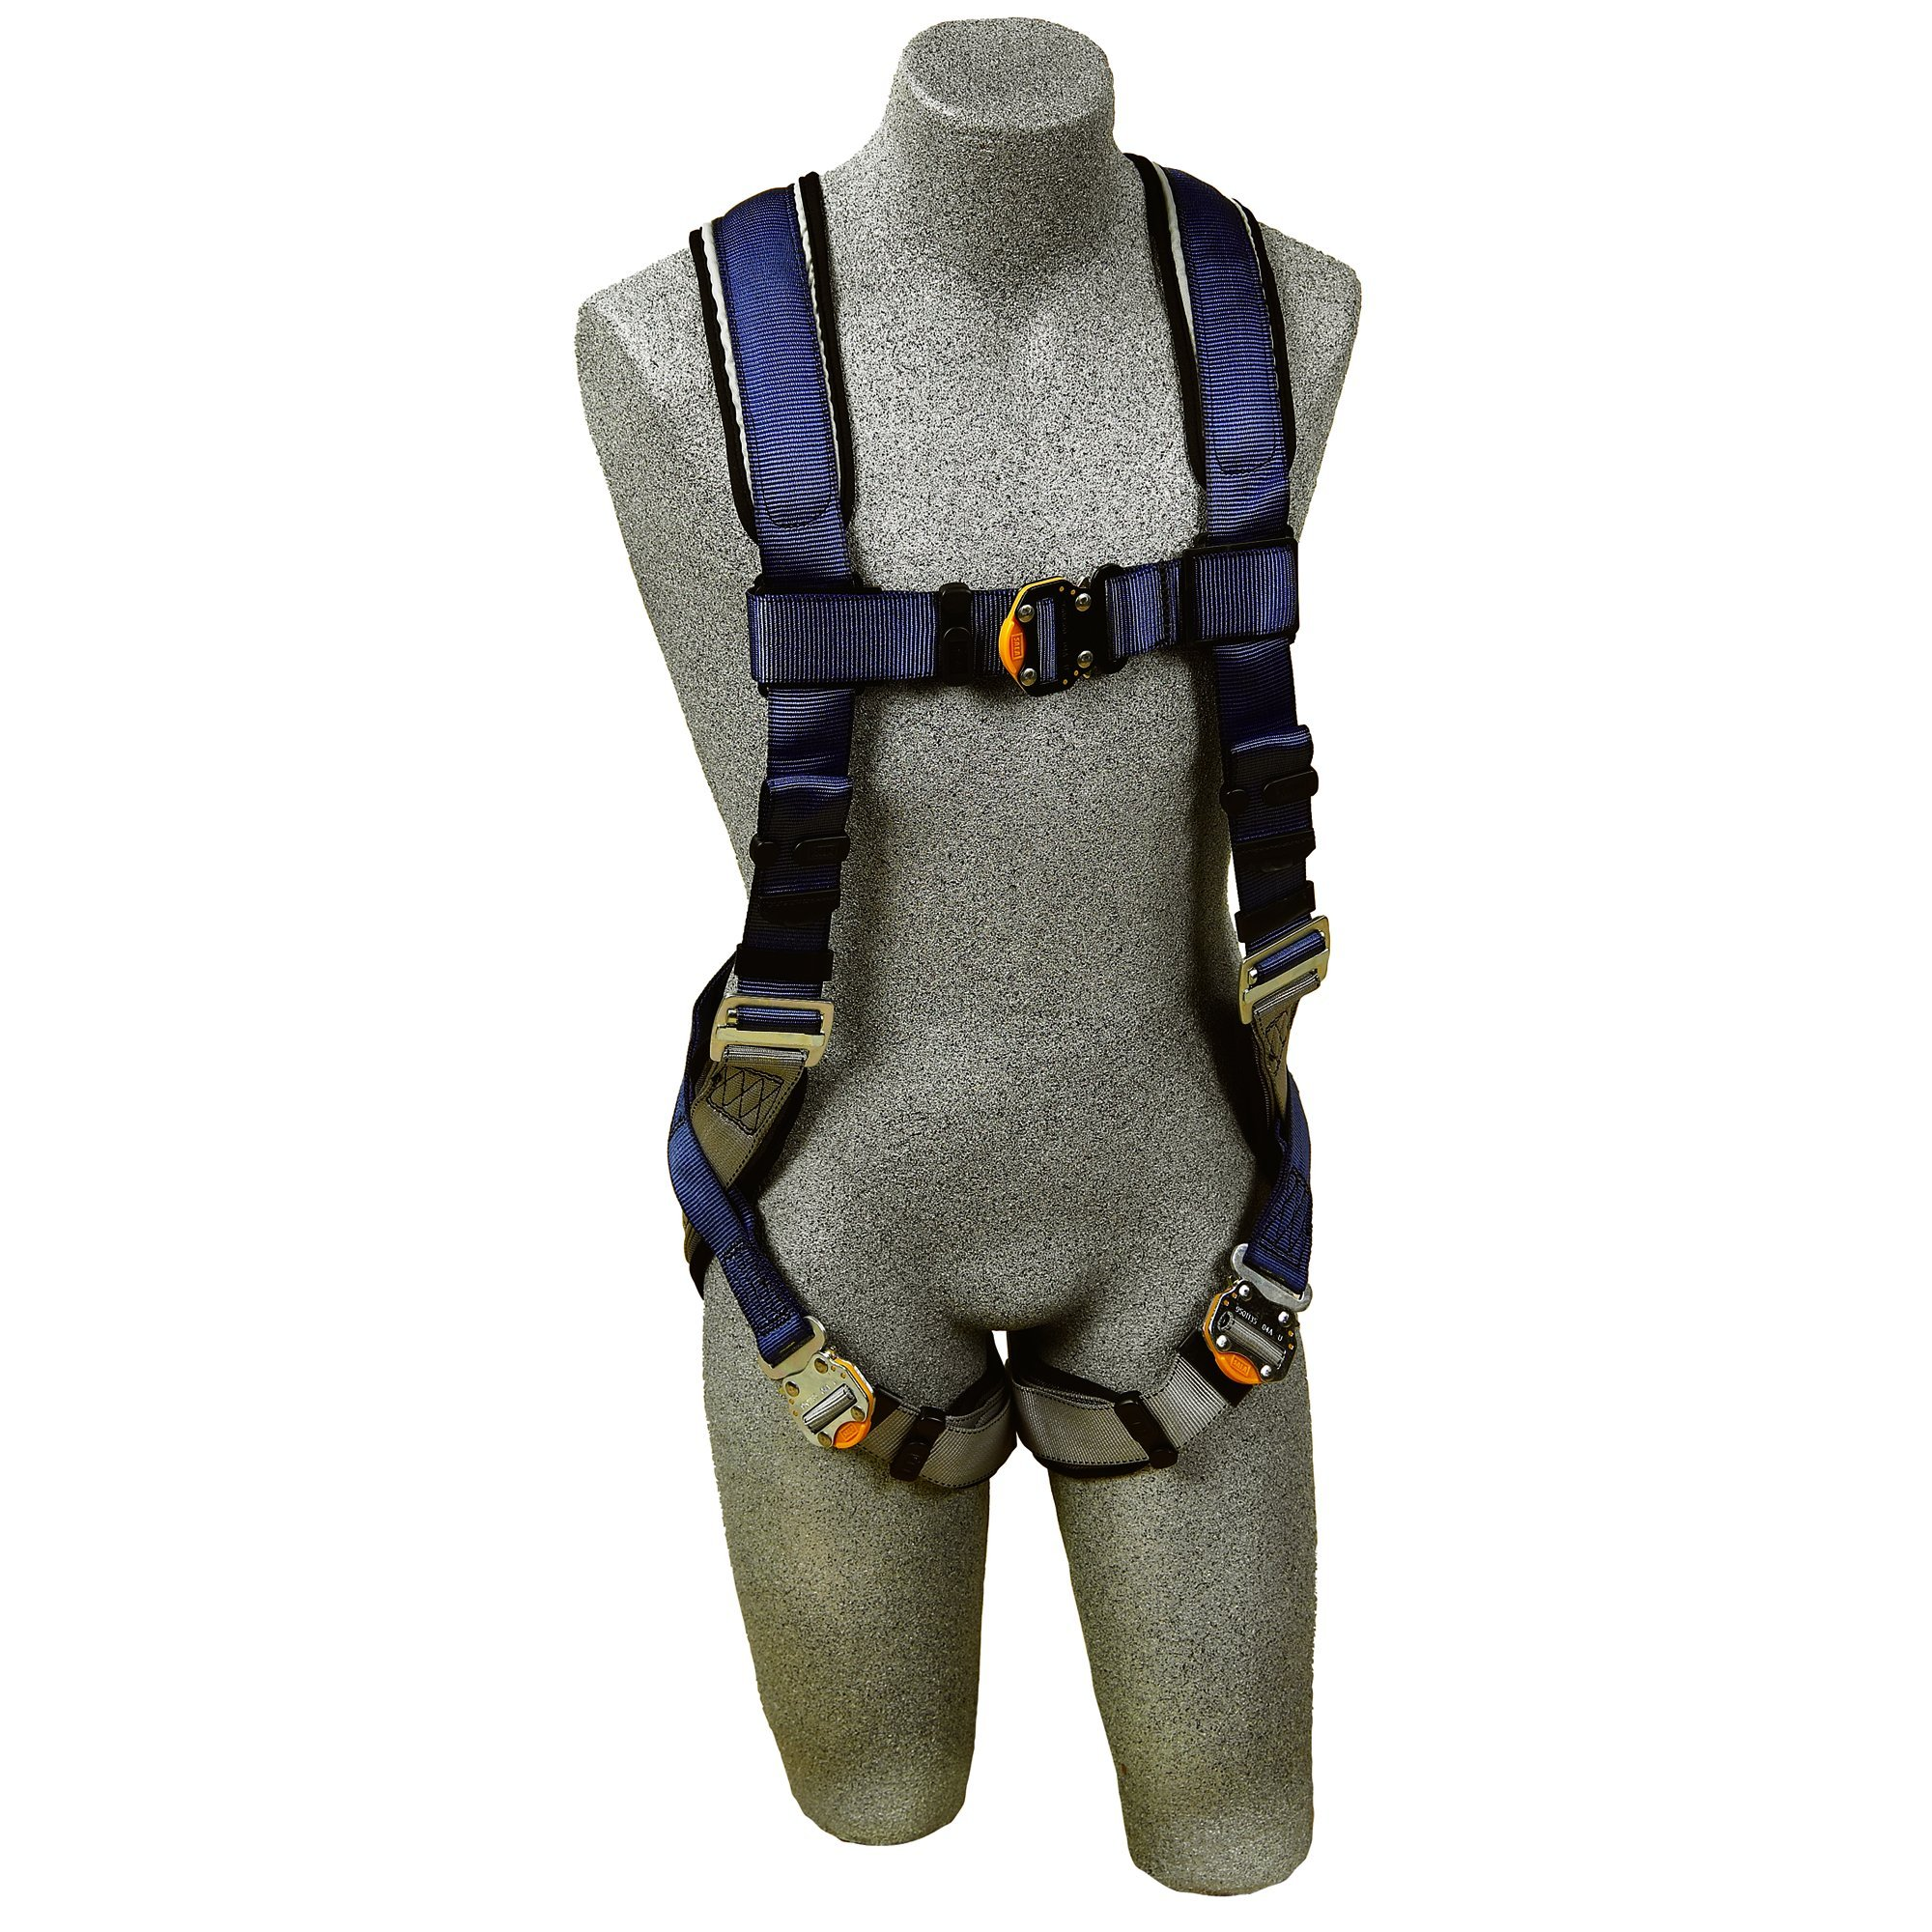 3M DBI-SALA ExoFit Vest Style Harness, Back D-Ring, Medium, 1107976